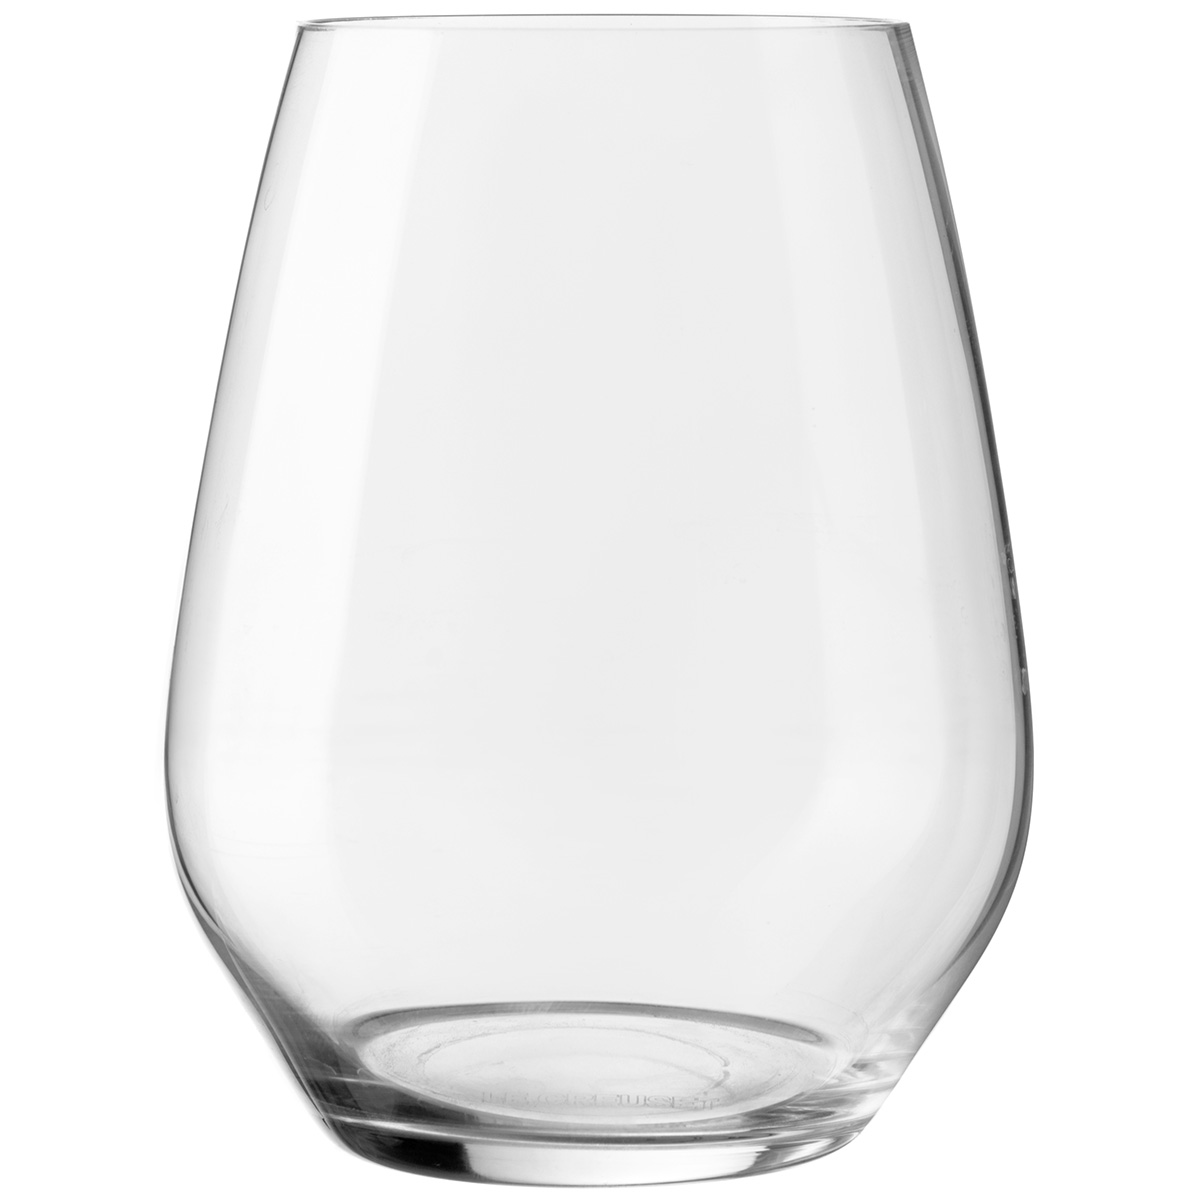 Image of   Le Creuset vandglas - 4 stk.